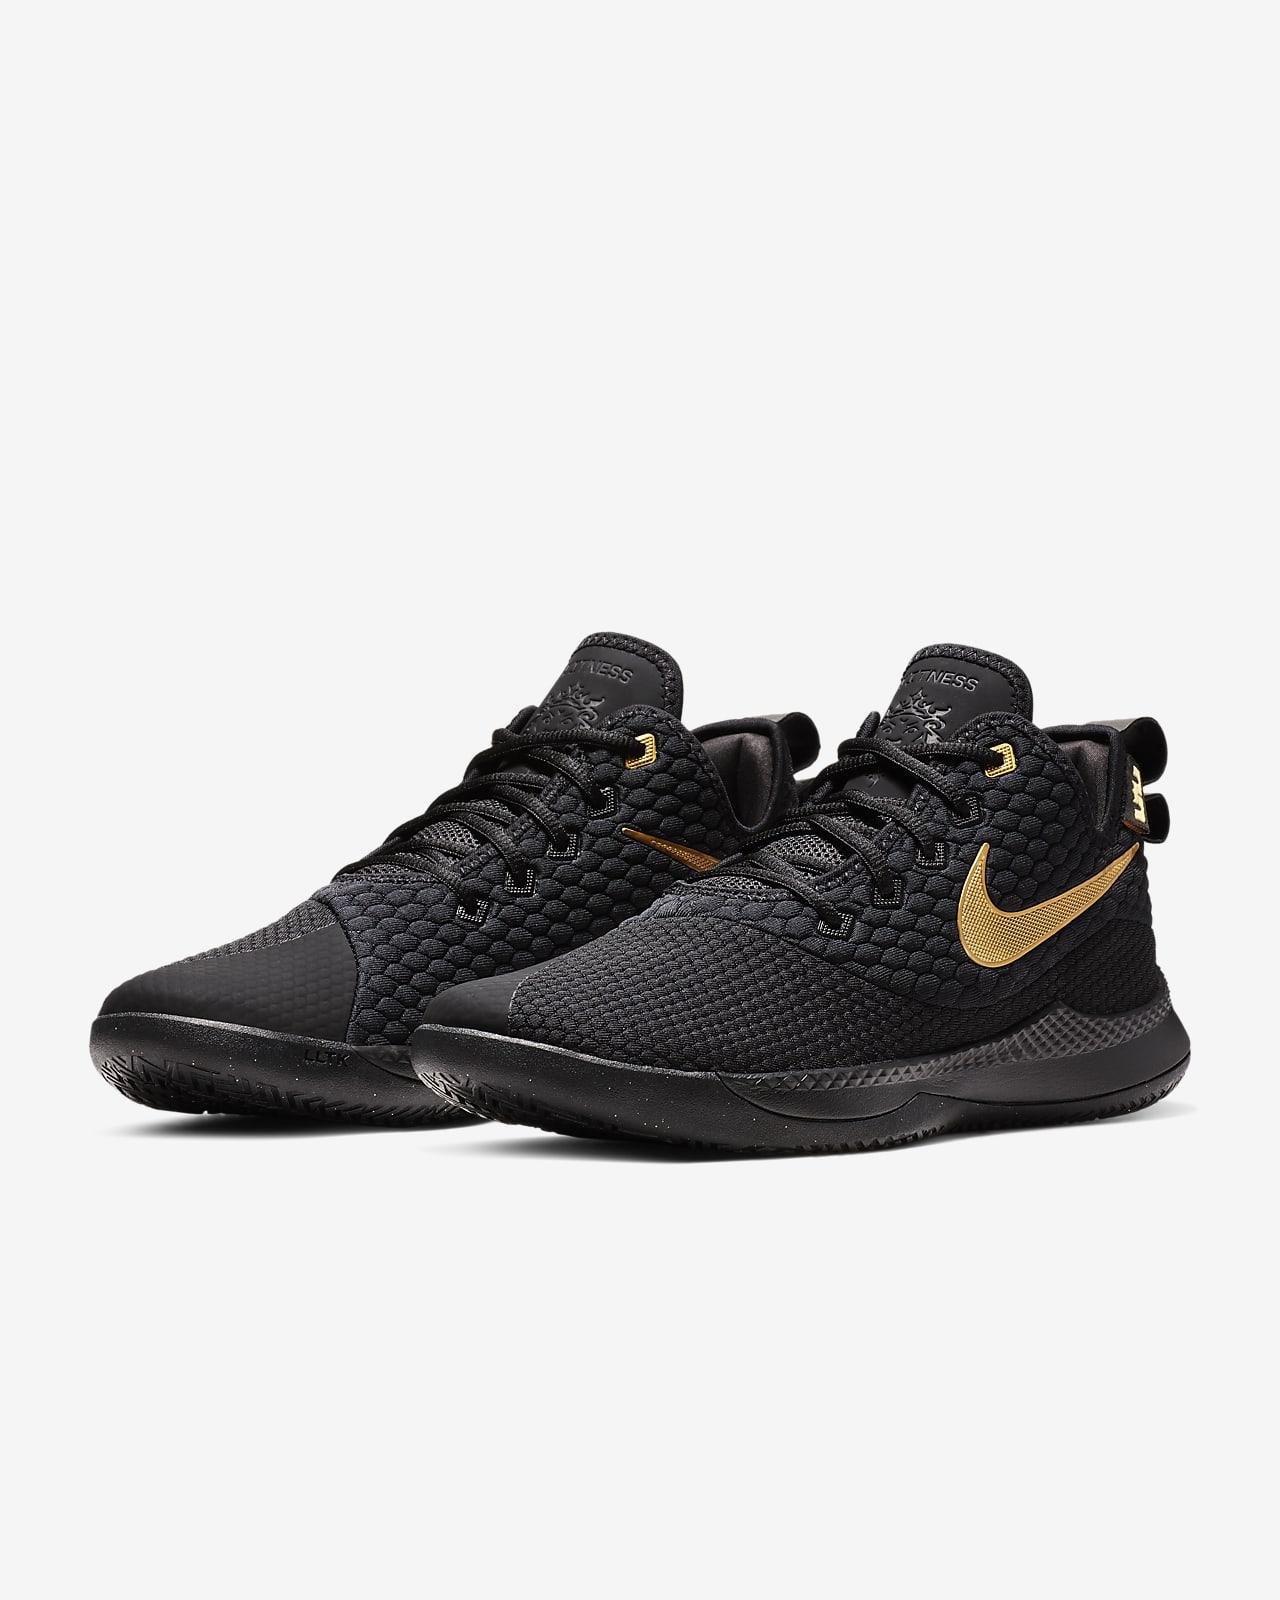 pimienta Exactamente Pedicab  LeBron Witness III Men's Shoe. Nike NO